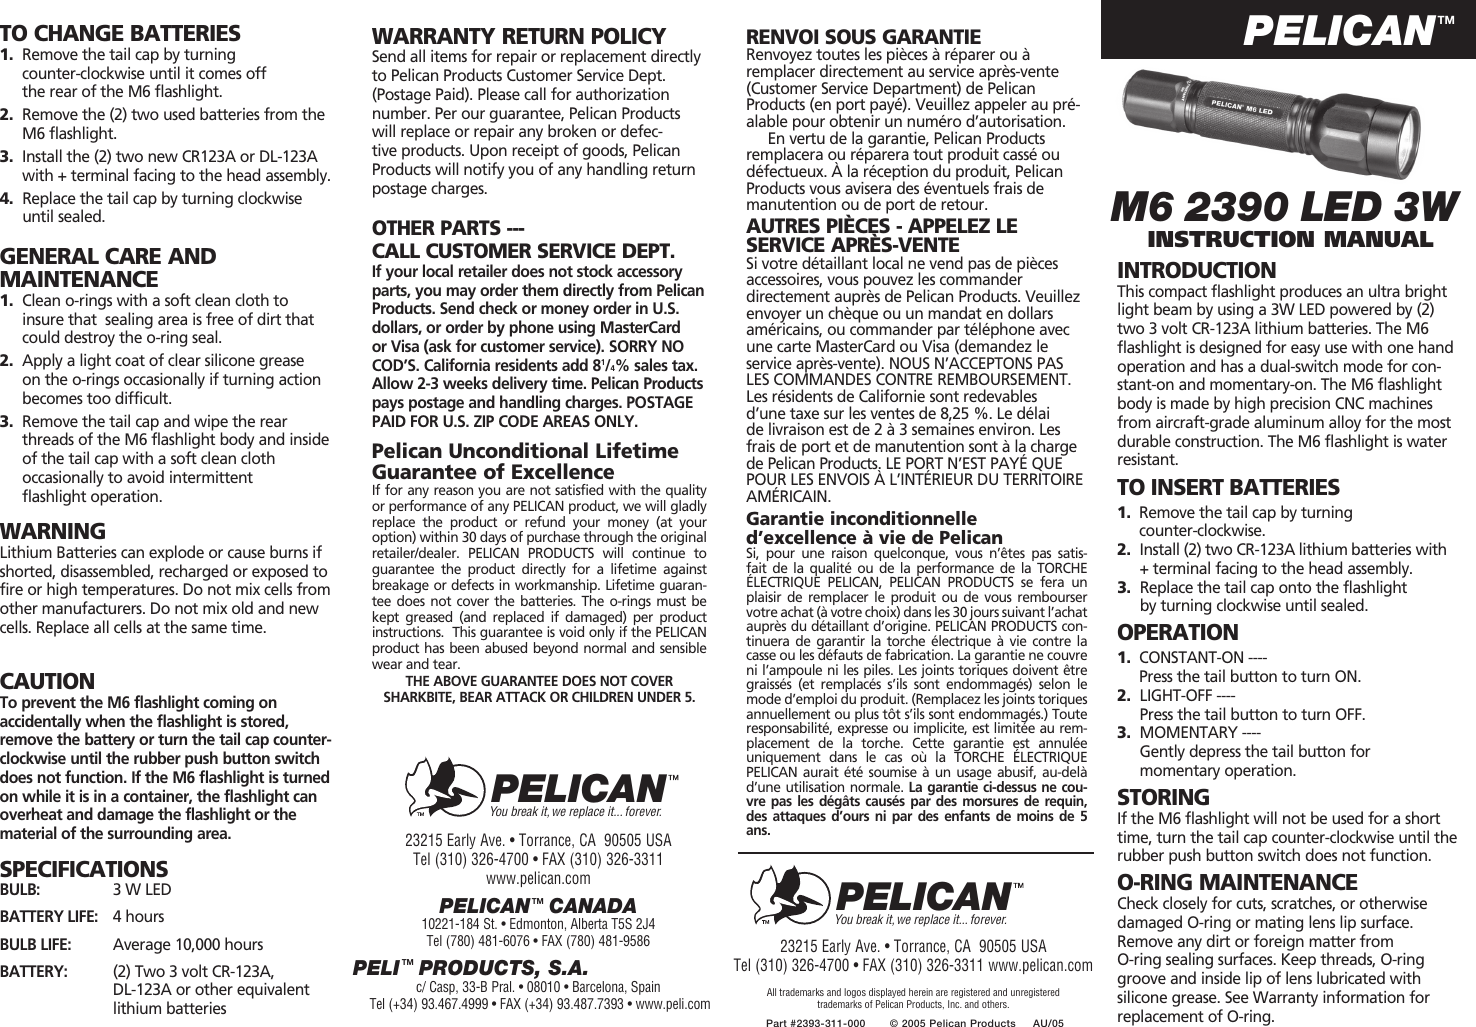 Pelican M6 2390 Led 3W Users Manual